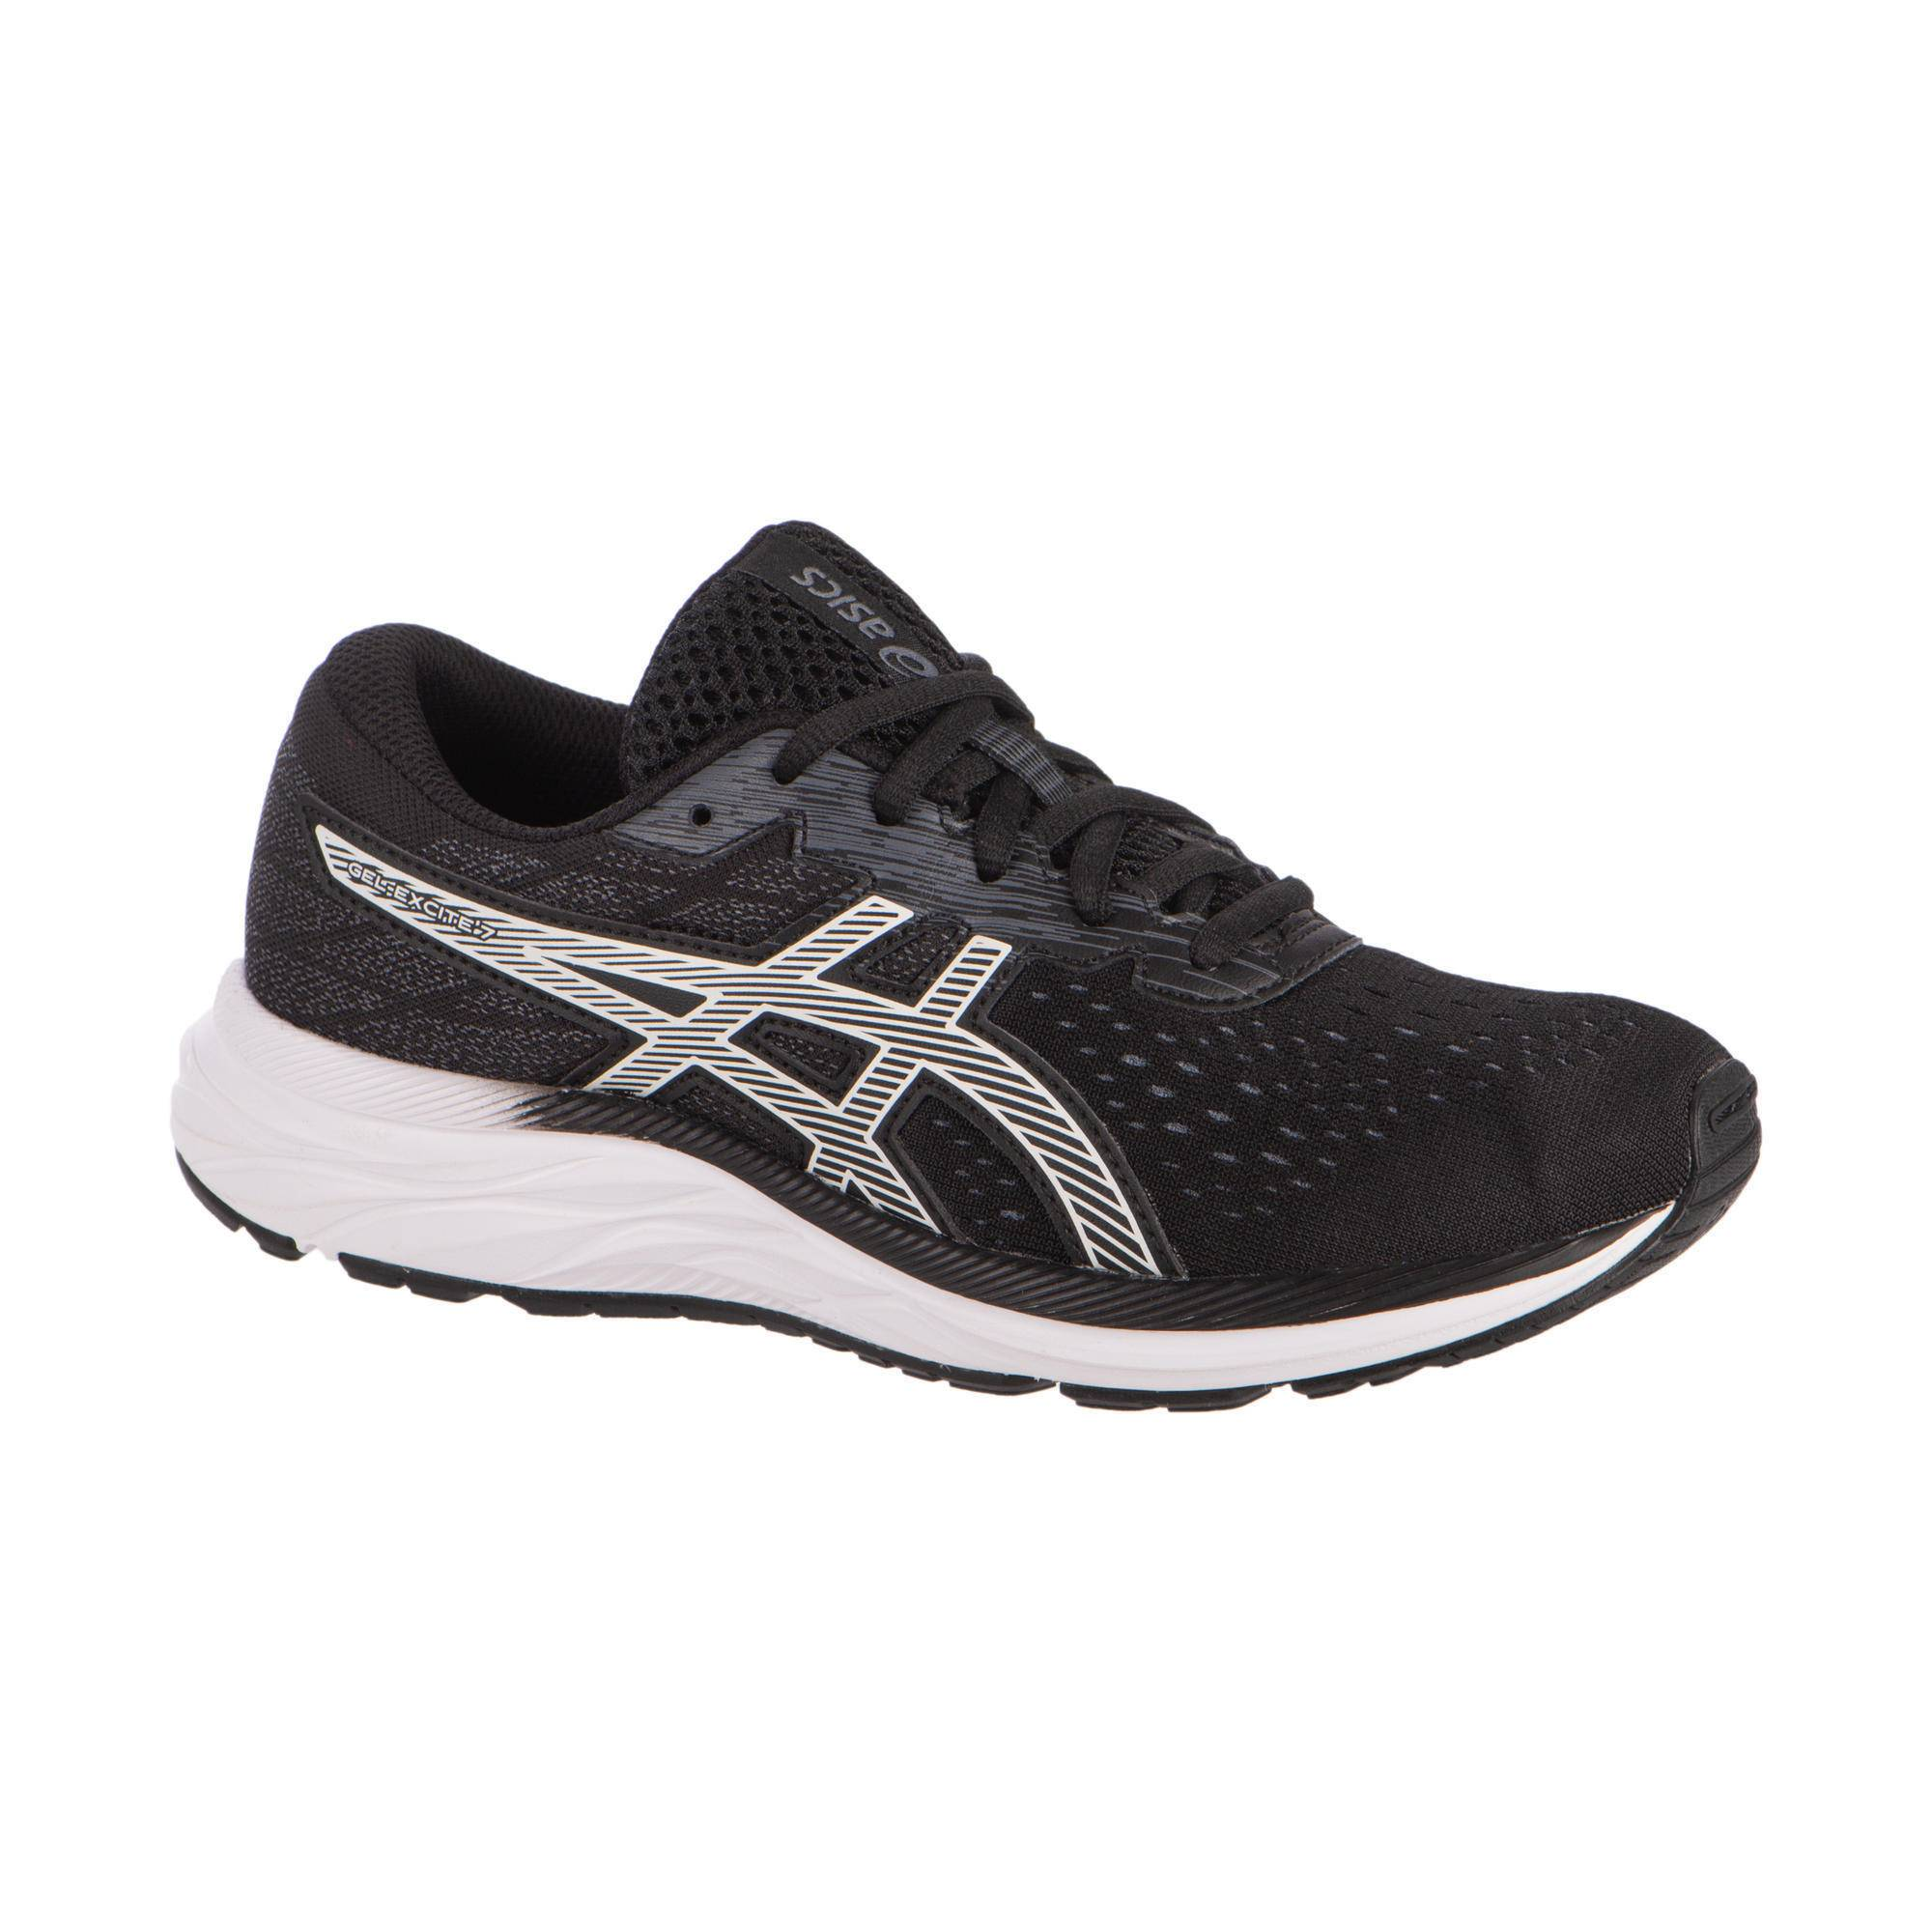 ASICS Chaussure athlétisme enfant Gel Excite. - ASICS - 37